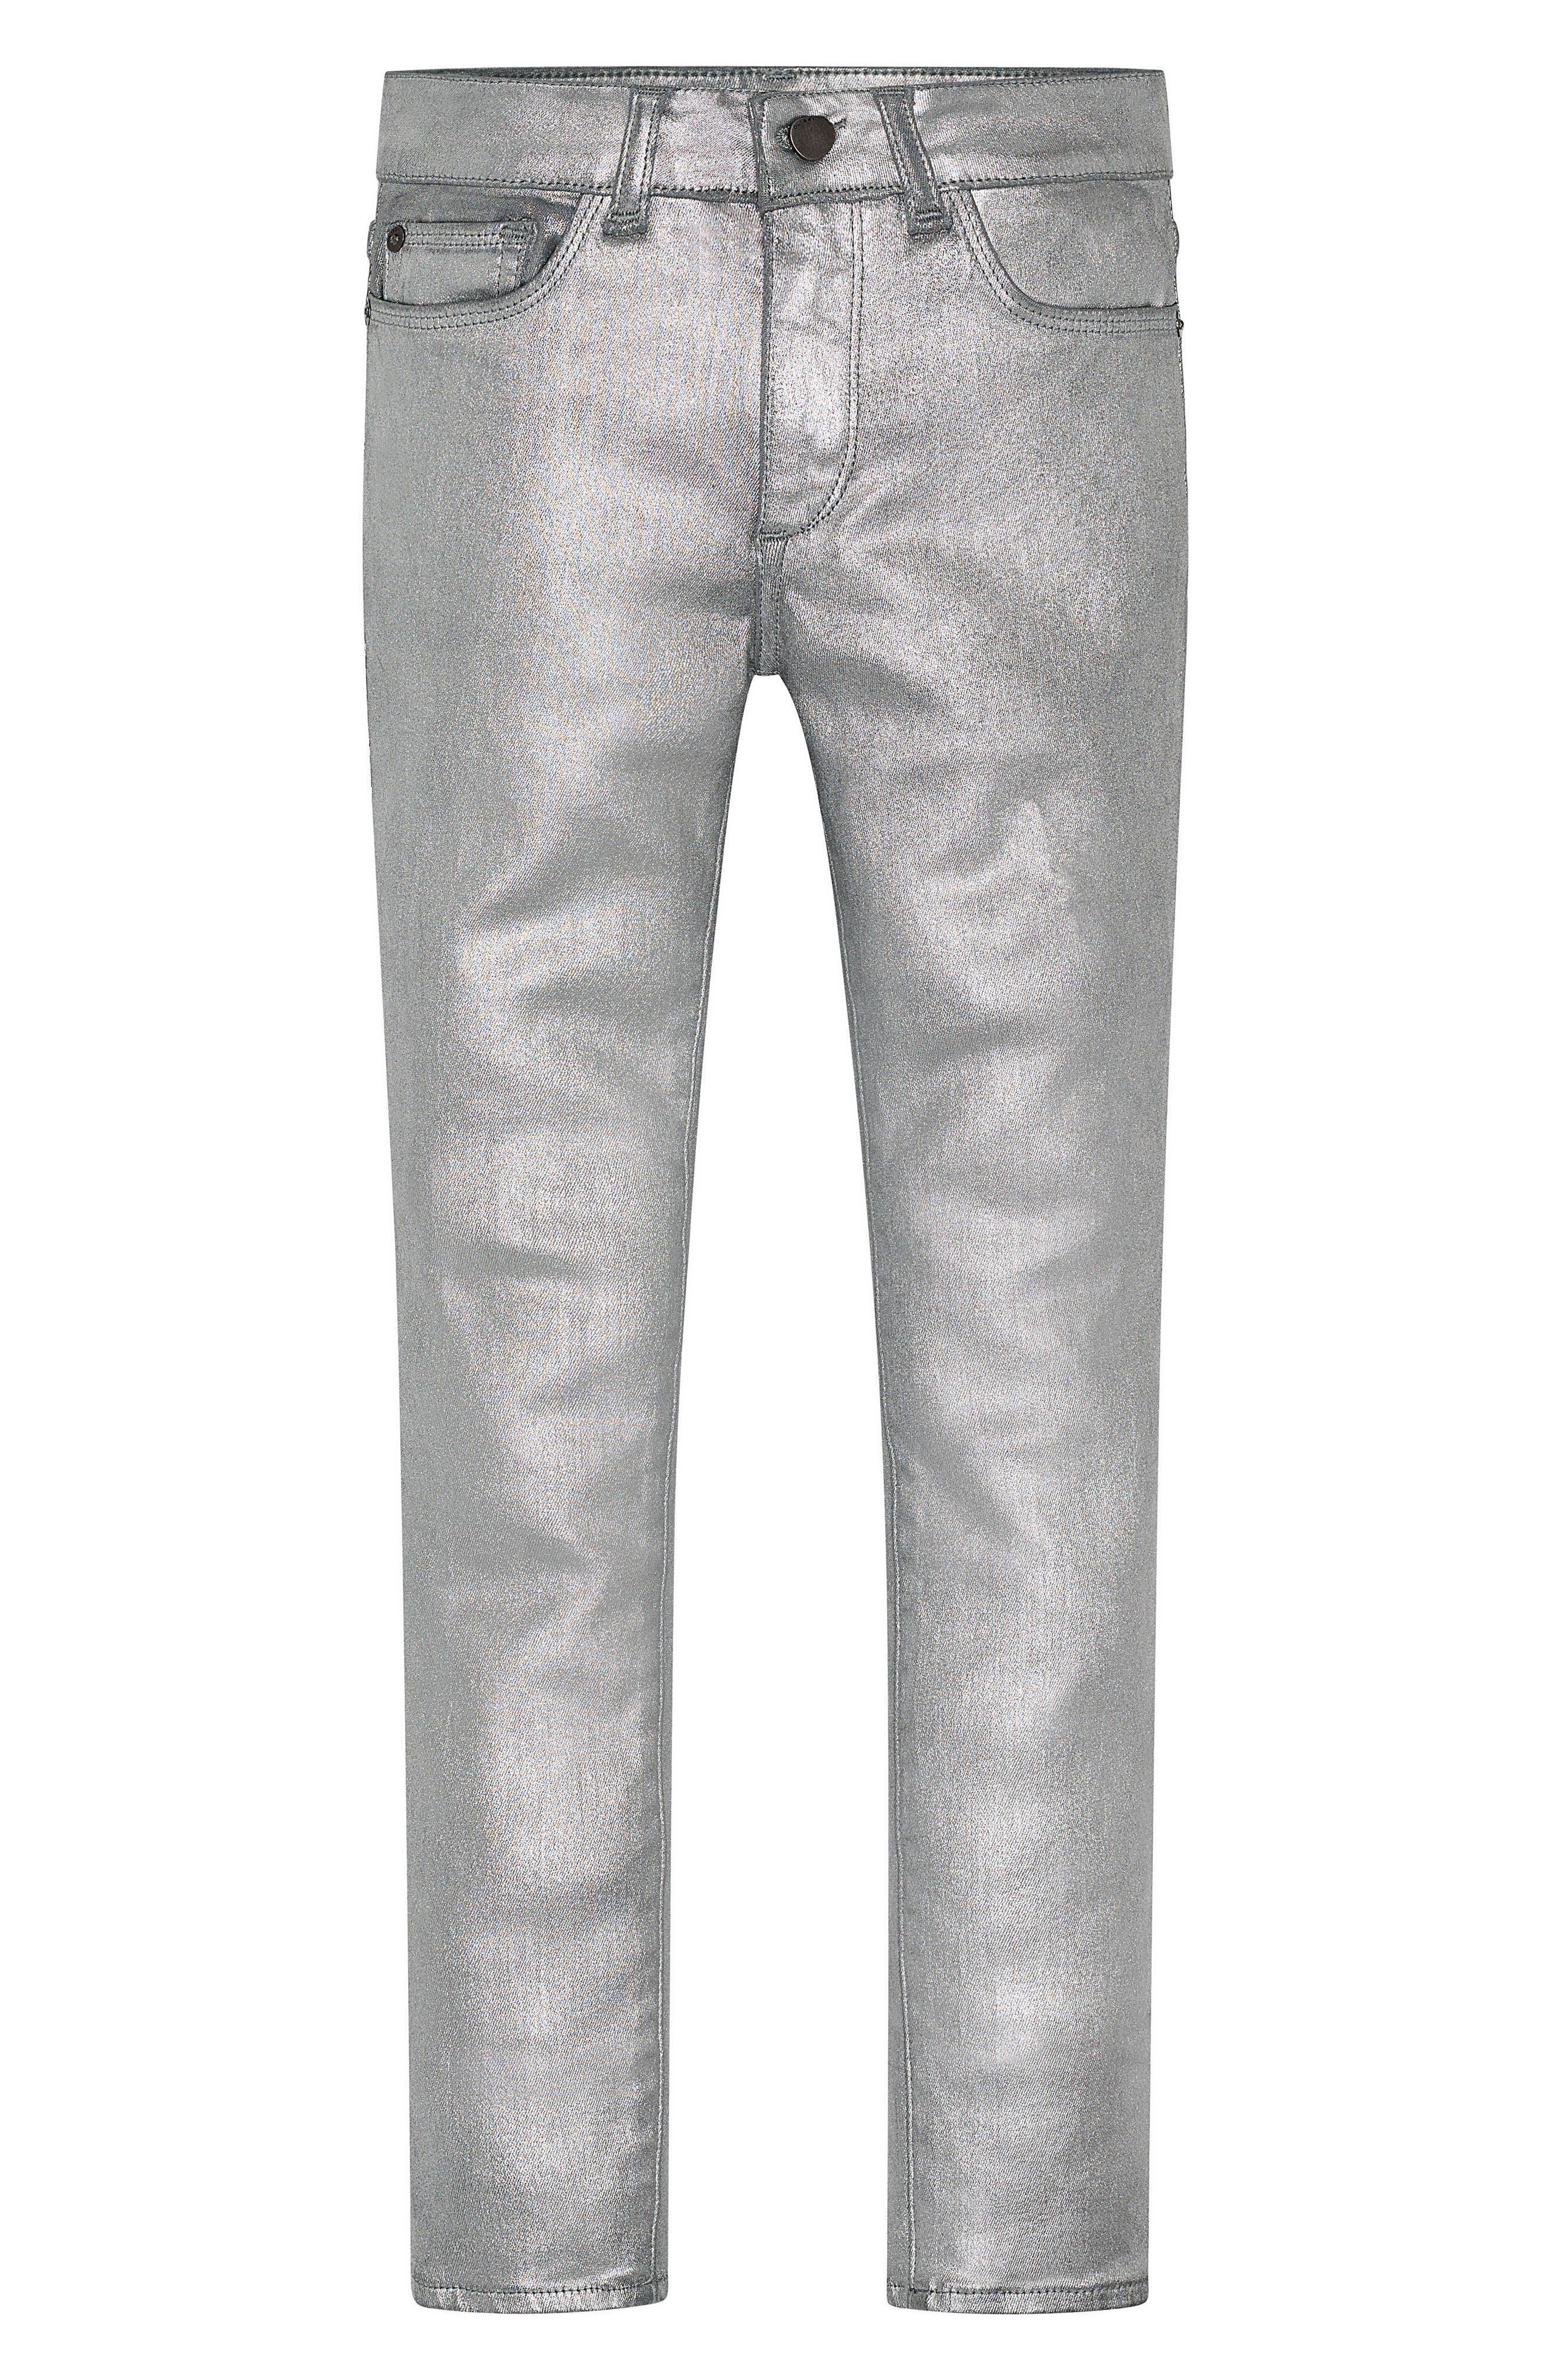 Chloe Coated Skinny Jeans,                             Main thumbnail 1, color,                             Silverado